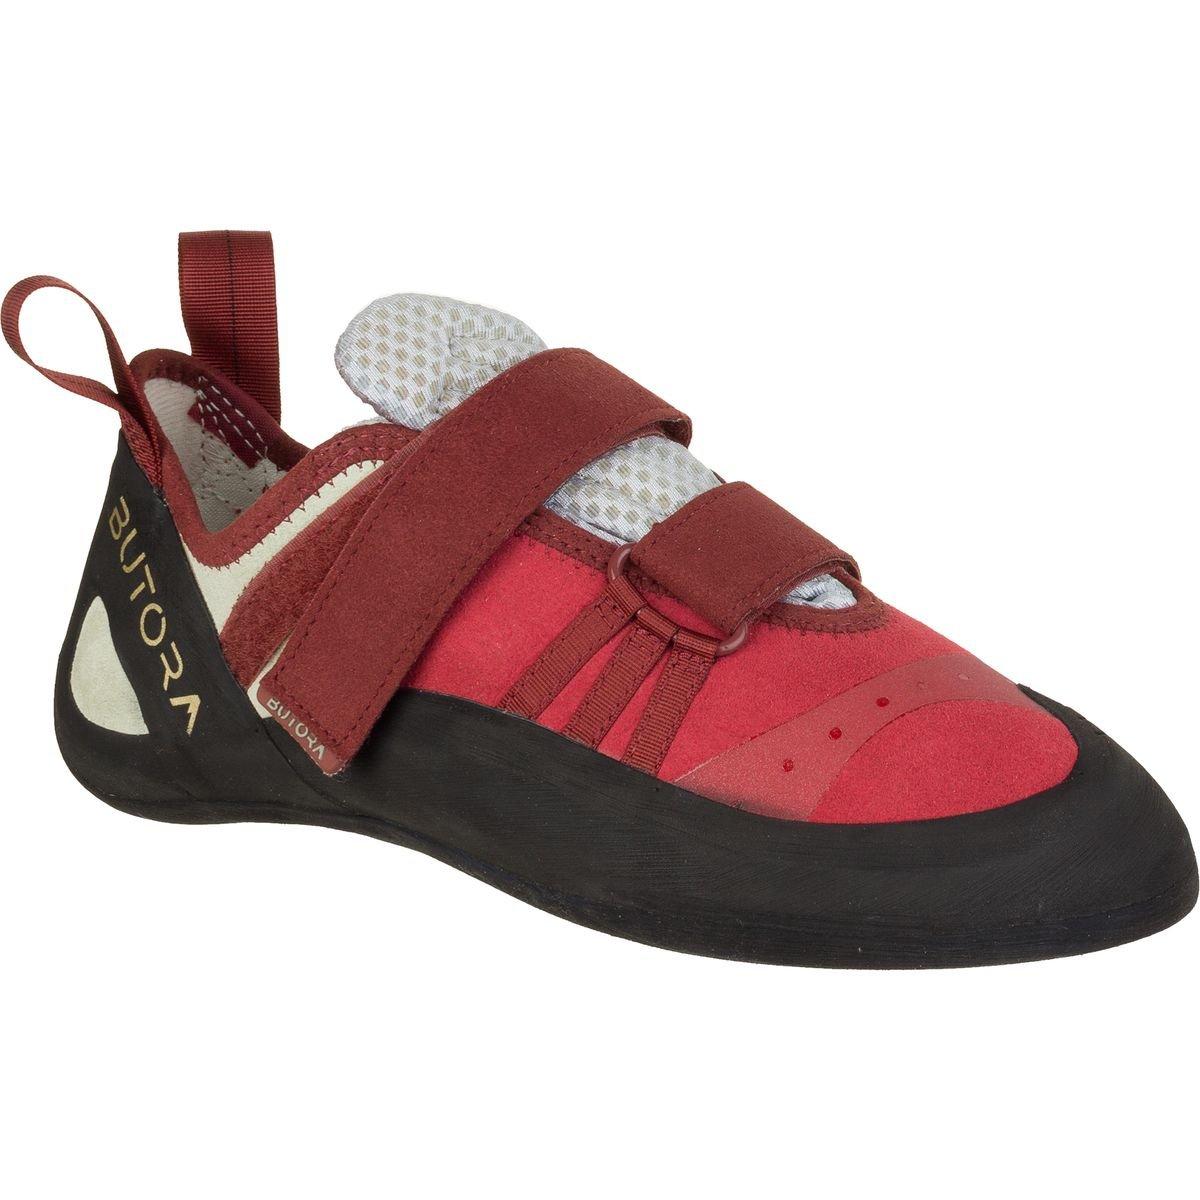 Butora Endeavor Wide Fit Climbing Shoe - Women's Crimson 9